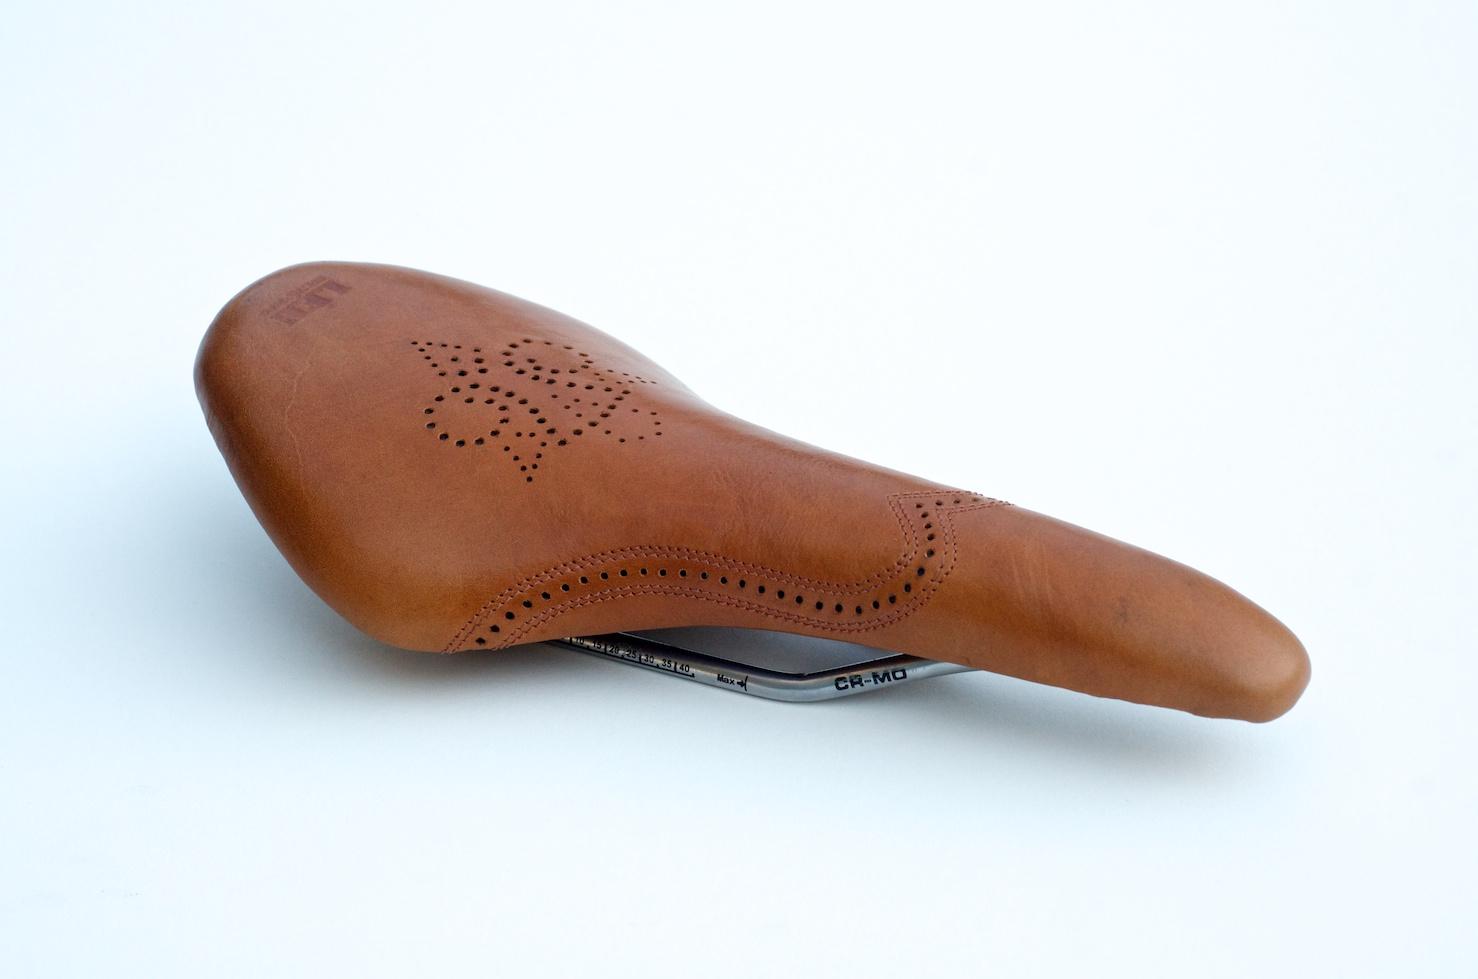 Leh-Seats-carson-leather-bike-seat-custom-oxford-brogue-shoe-saddle-bike-bicycle-brooks-hand-made 10.jpg